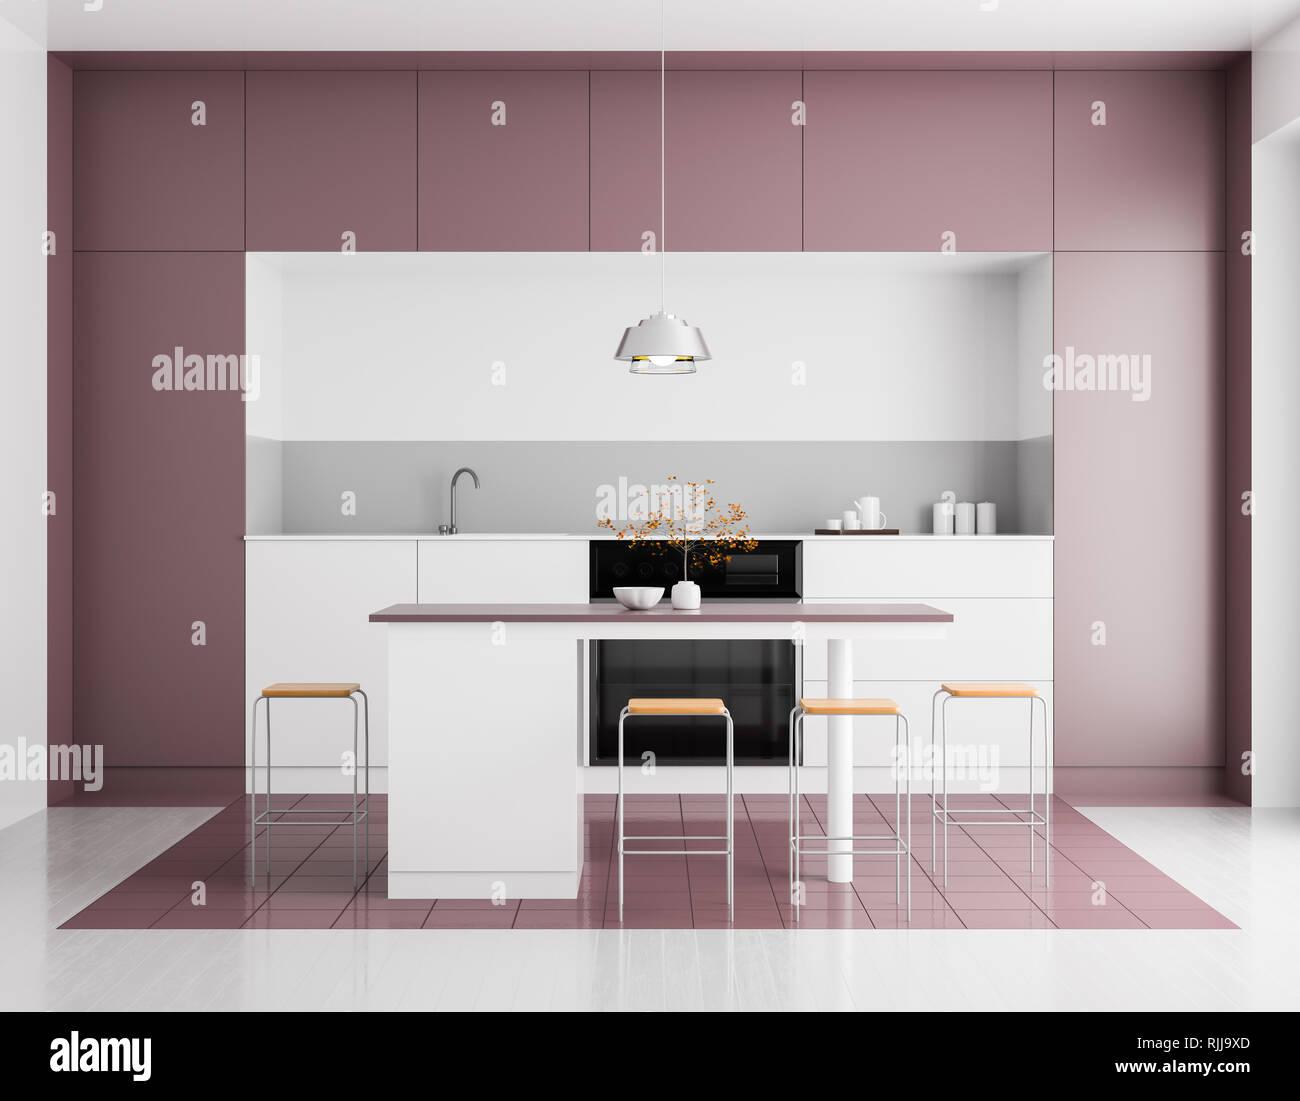 Modern Bright Kitchen Interior Minimalistic Kitchen Design With Bar And Stools 3d Illustration Stock Photo Alamy